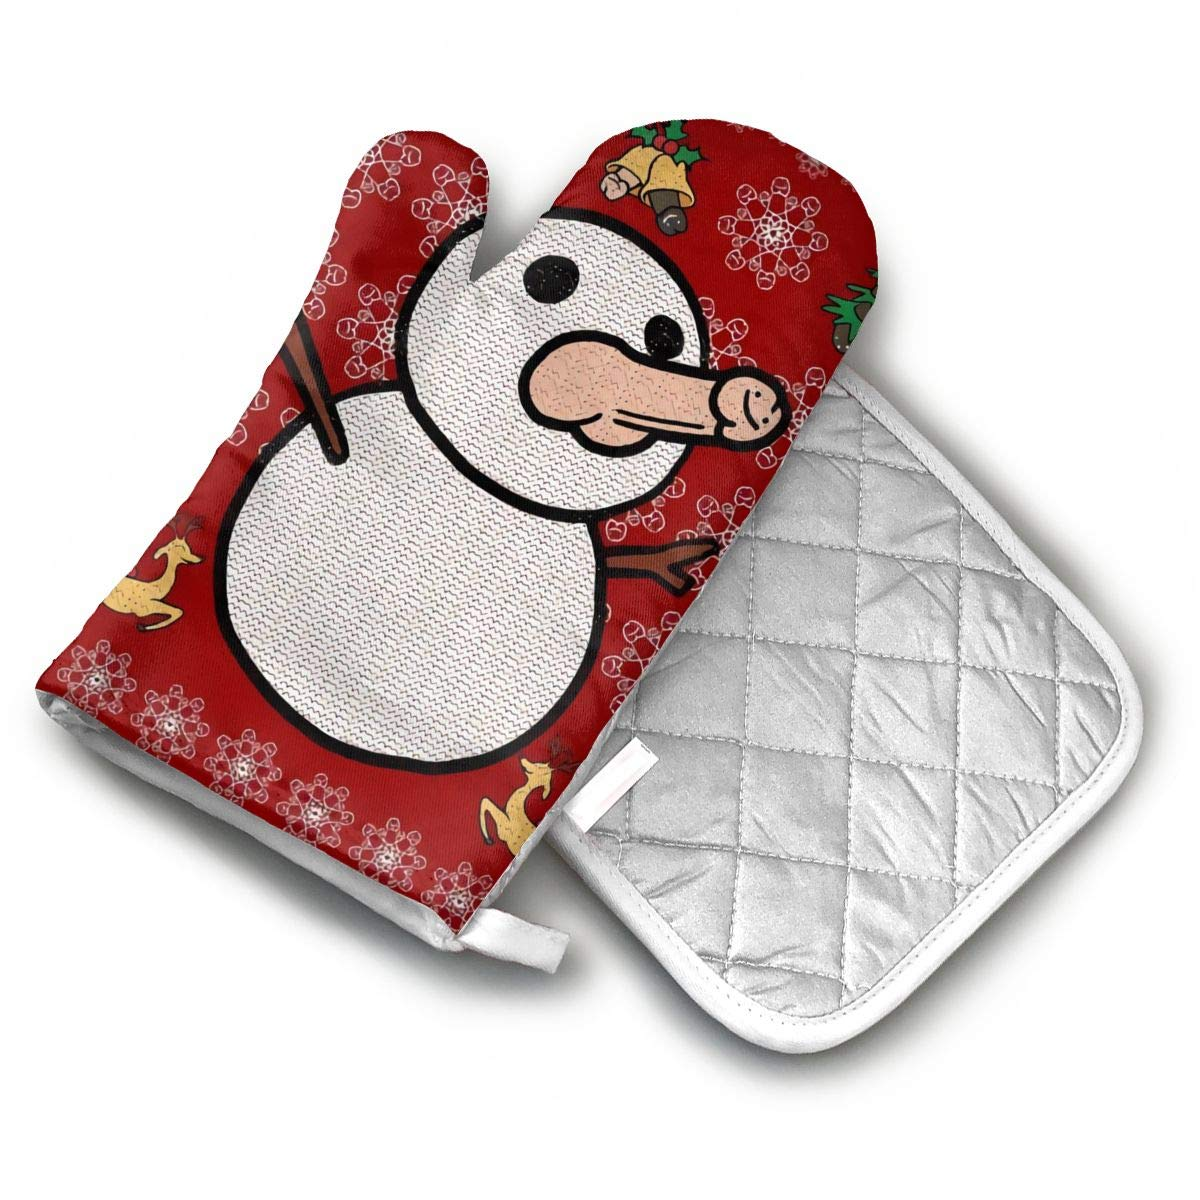 AISDHAJKSD Christmas Penis Snowman Sweater Premium Terylene/Nylon Oven Mitts and Pot Mat,Pot Mat/Hot Pads, Heat Resistant Gloves BBQ Kitchen